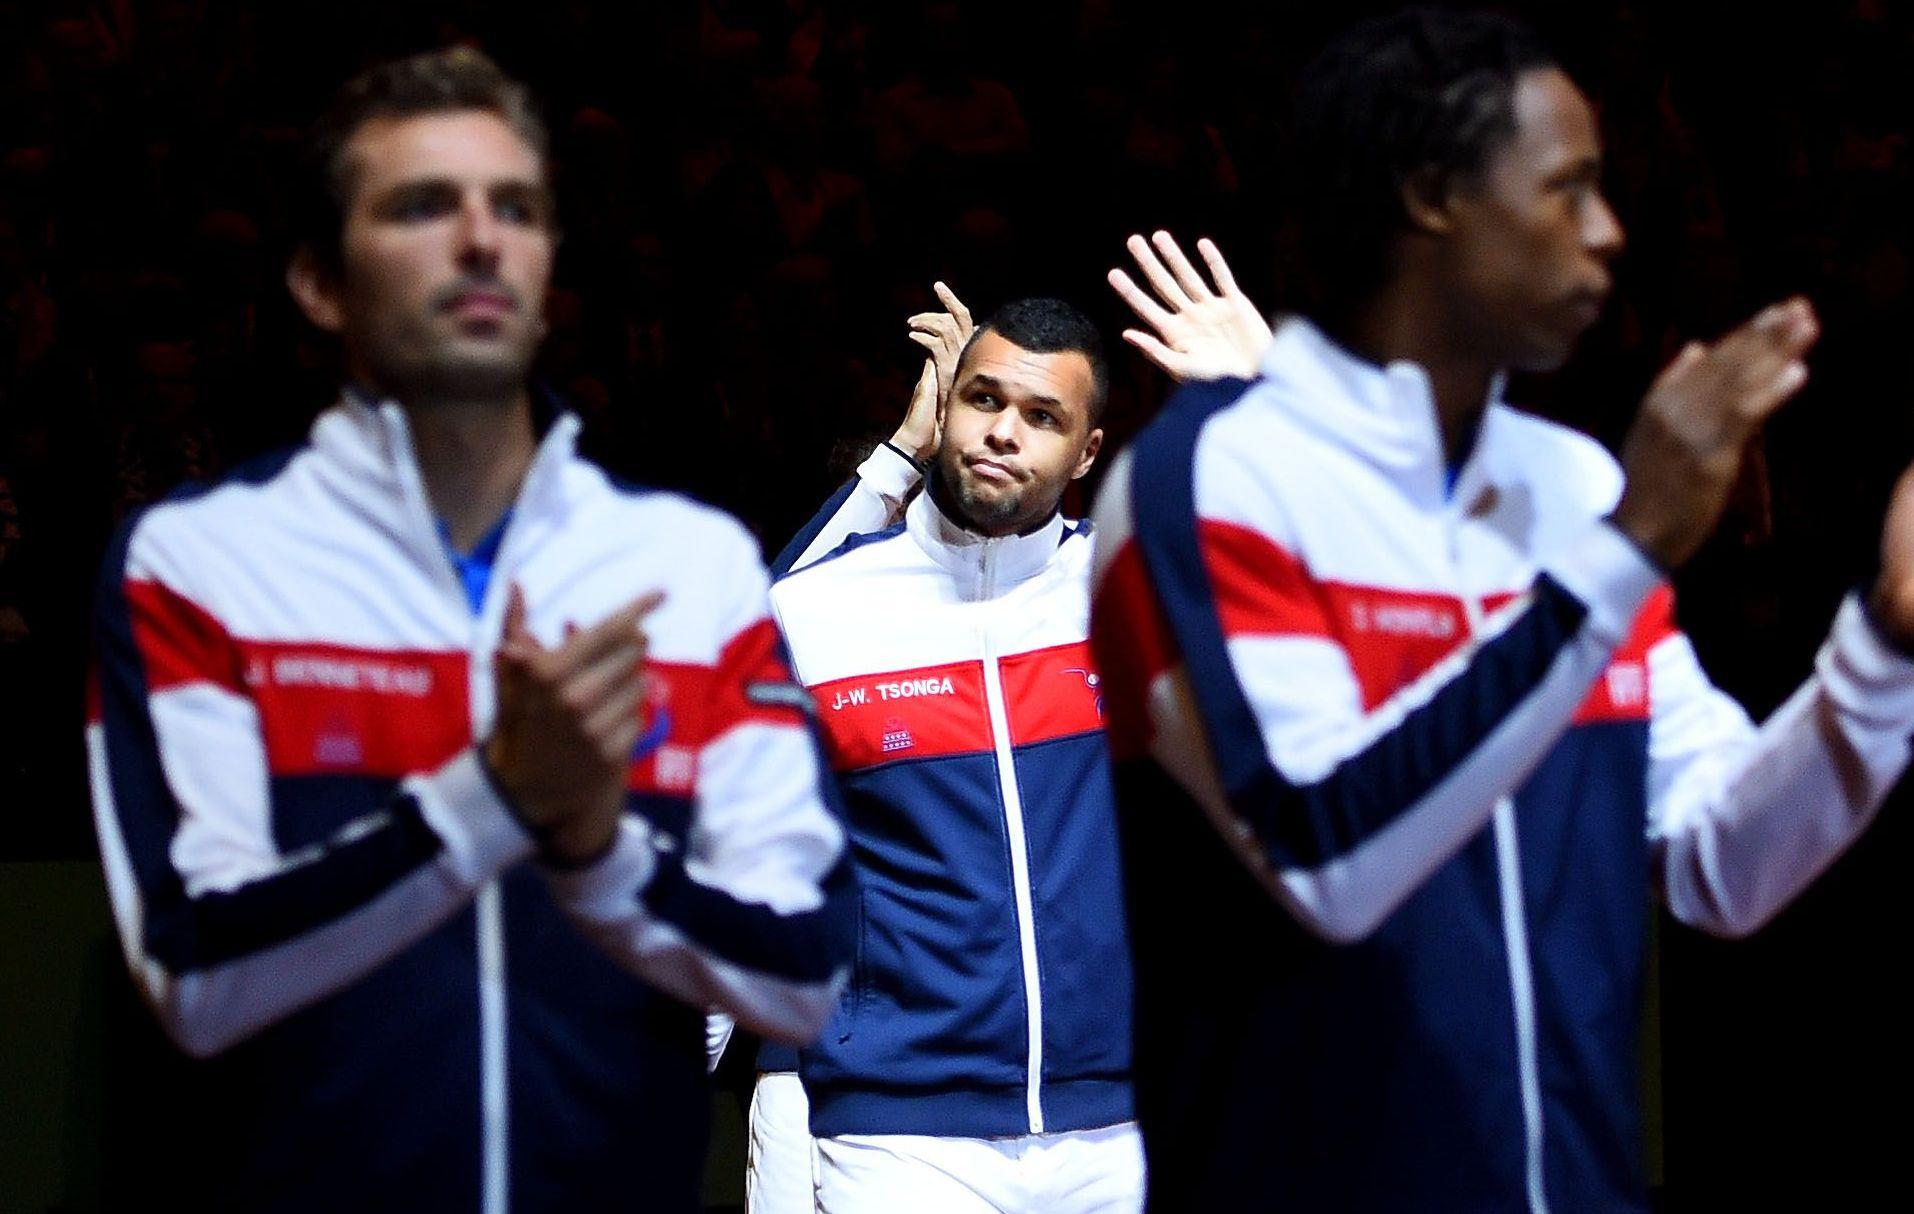 Coupe Davis - Qui pour affronter Federer ?